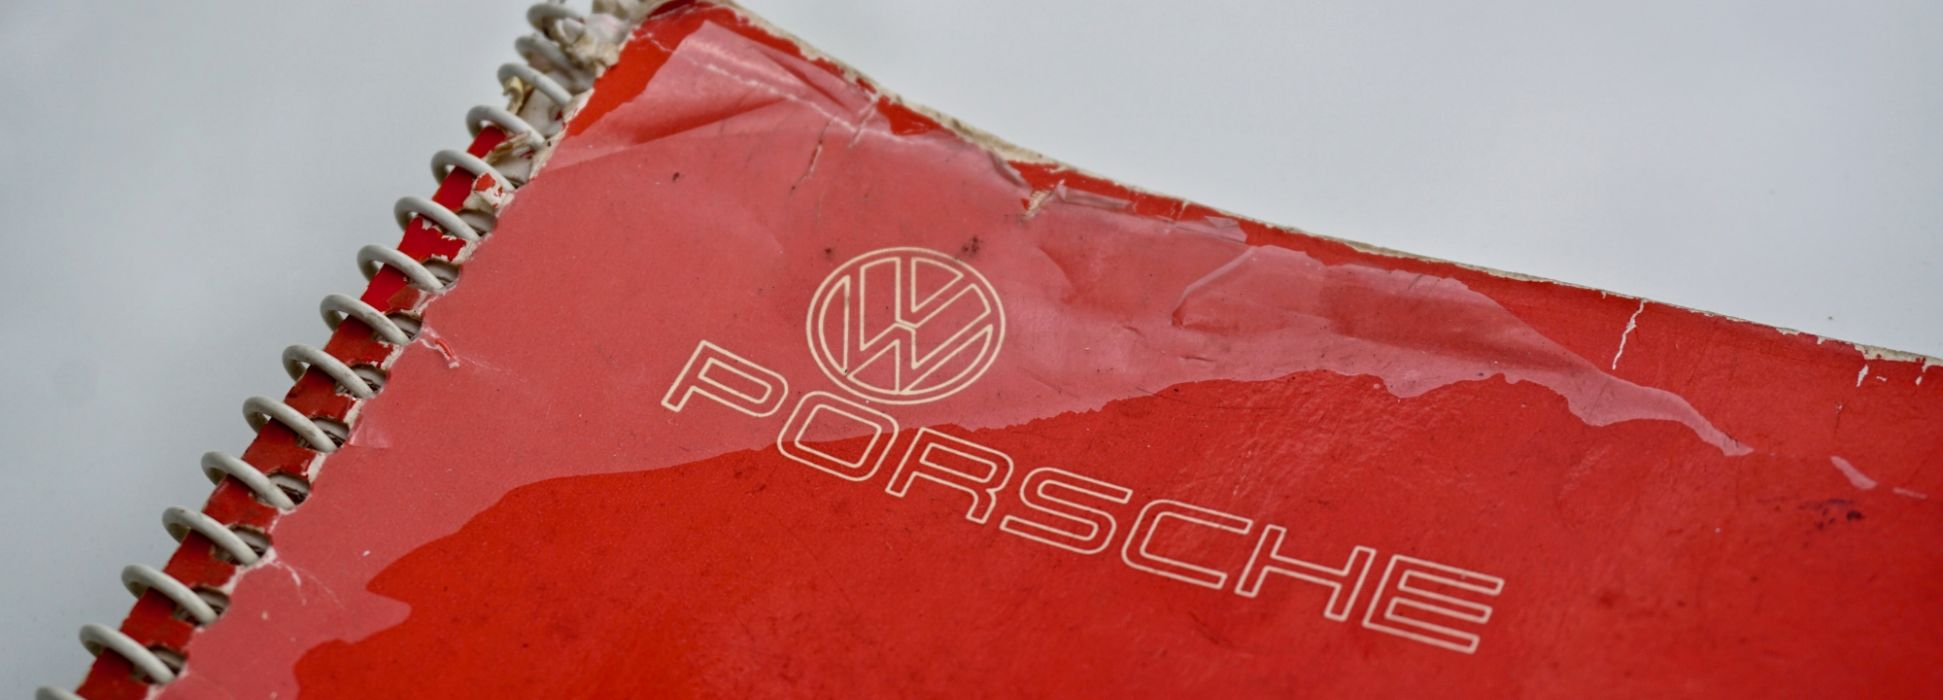 VW-Porsche 914 2.0 / 47 10